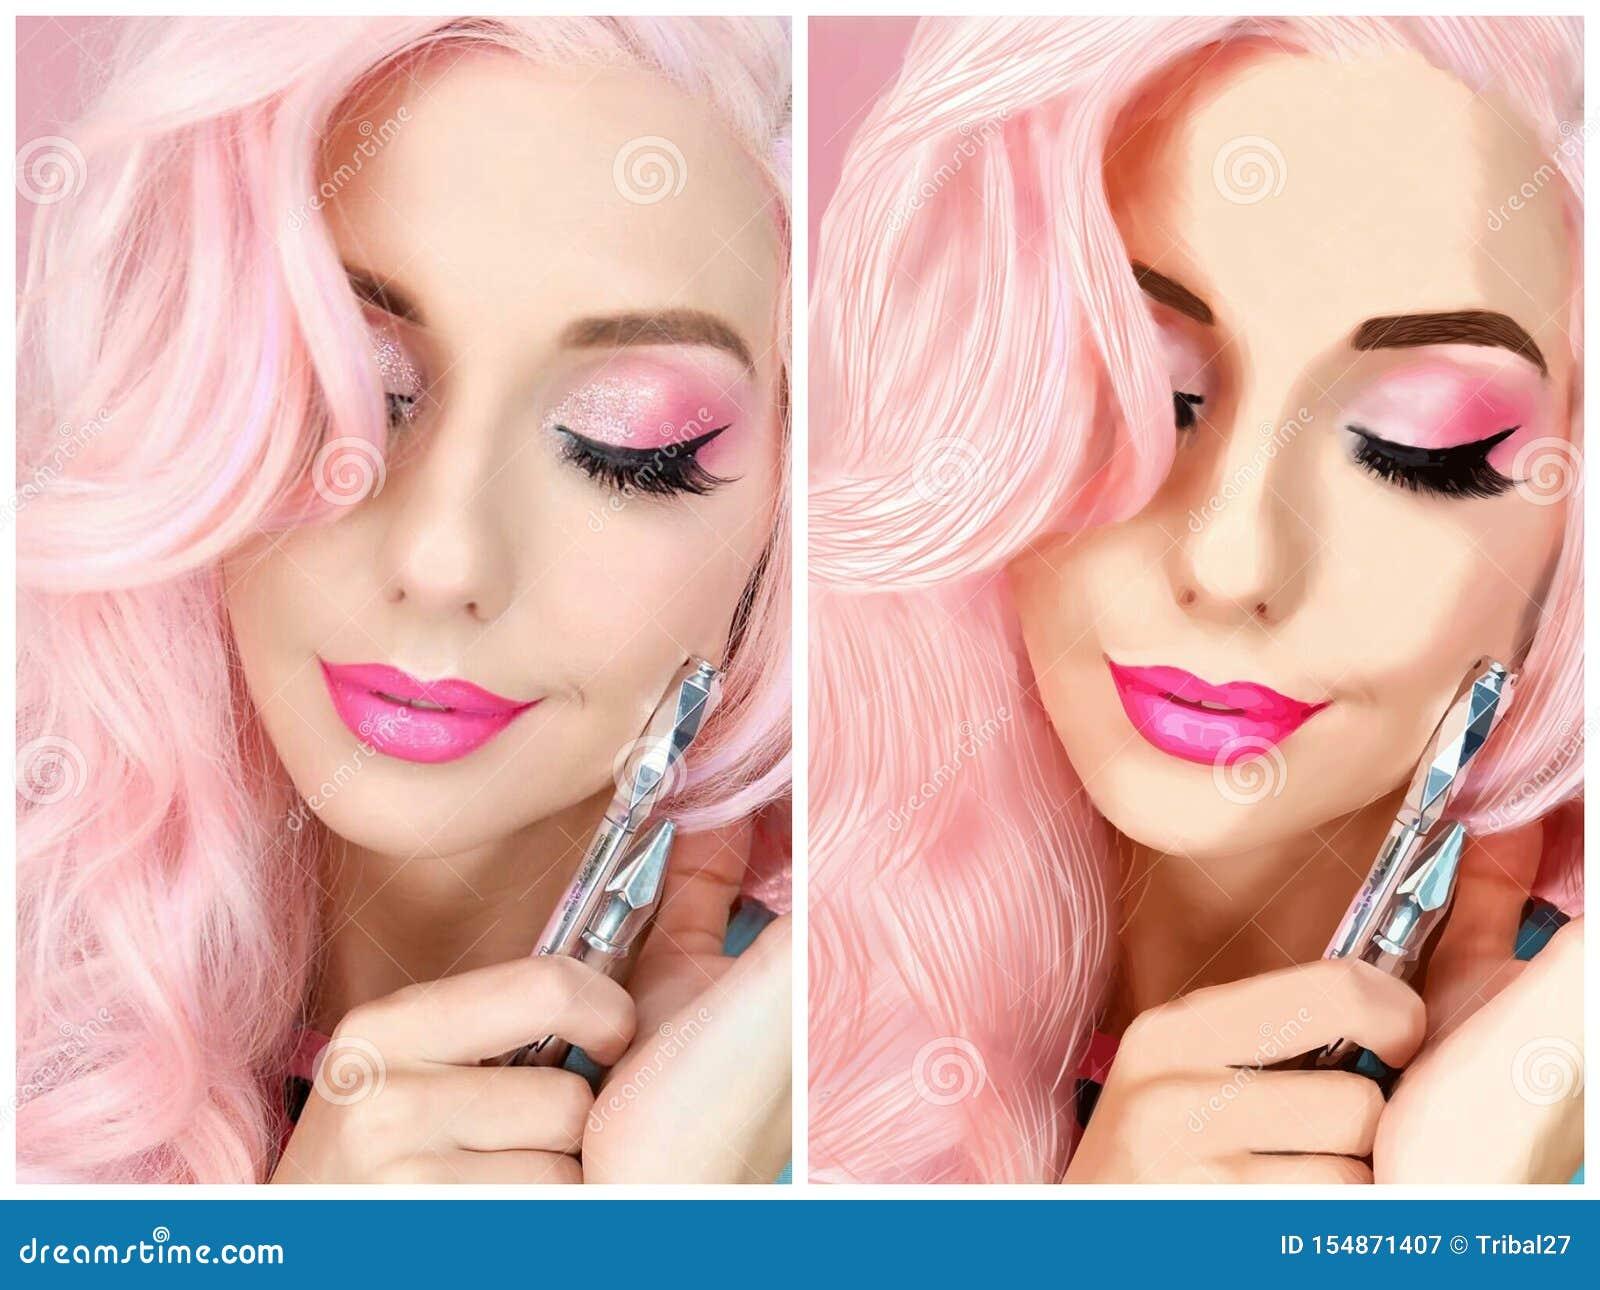 Figure Girl with Pink Hair stock illustration  Illustration